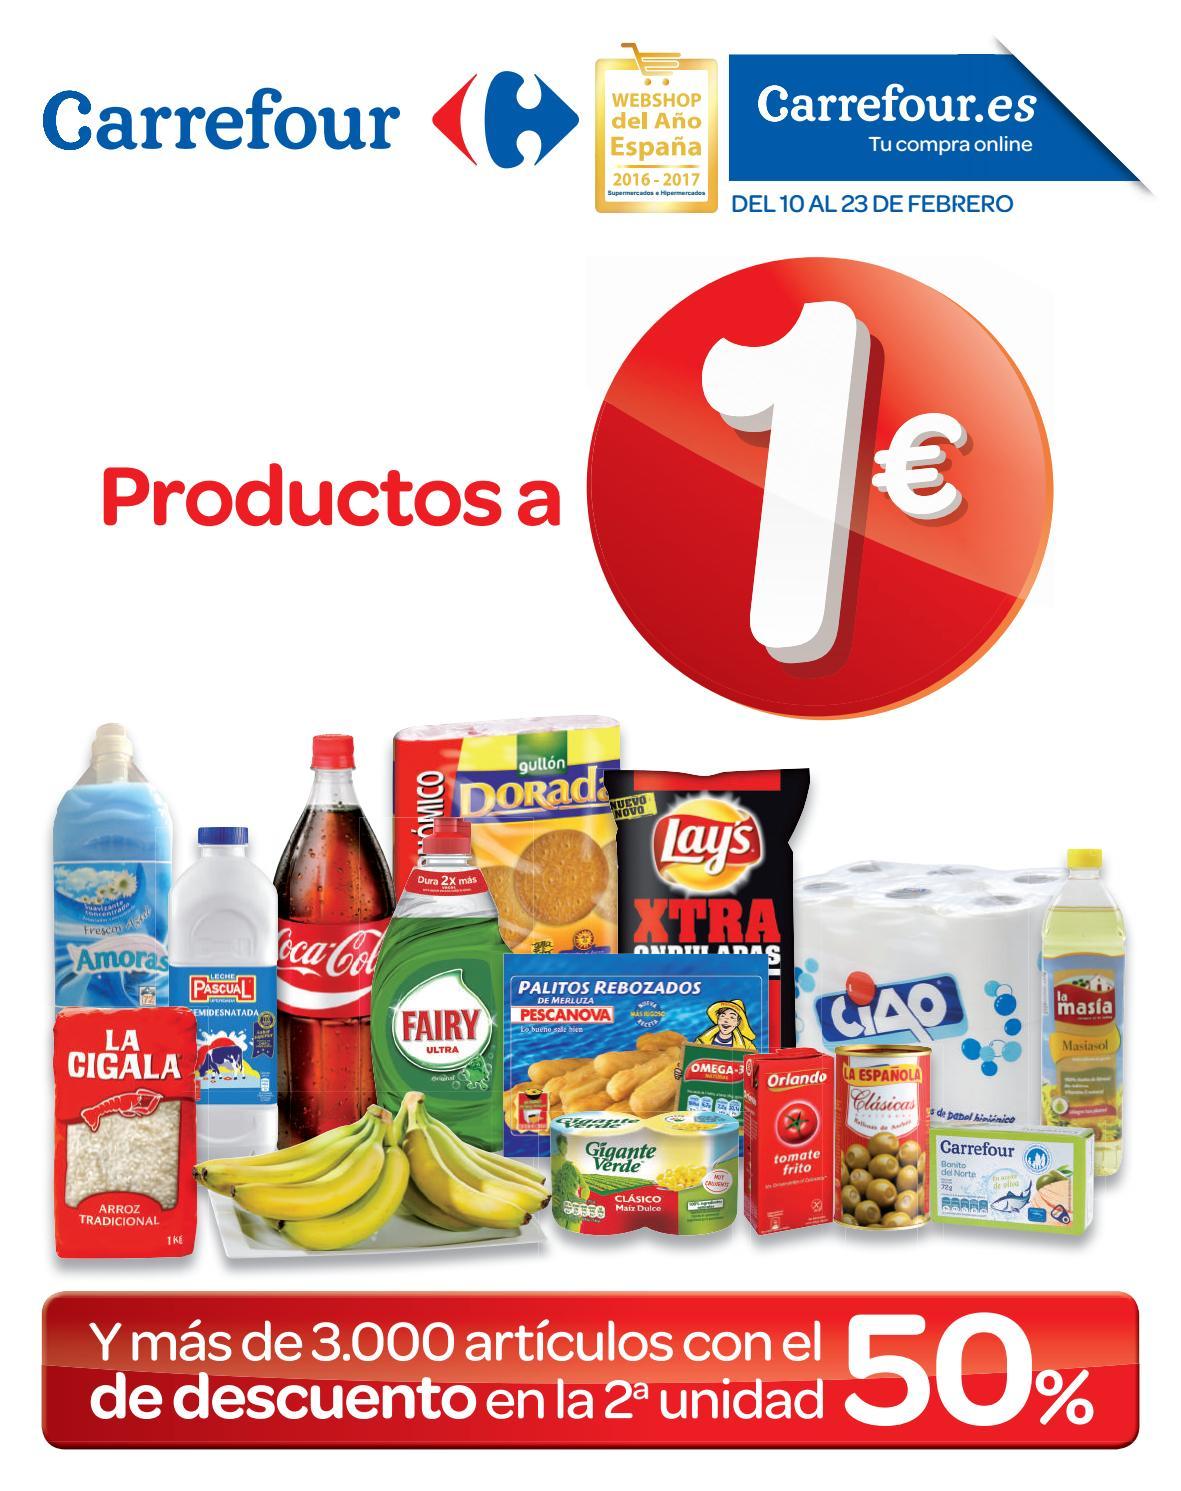 2a Unidad 70 By Ofertas Supermercados Issuu ~ Pinzas Sujeta Sabanas Carrefour